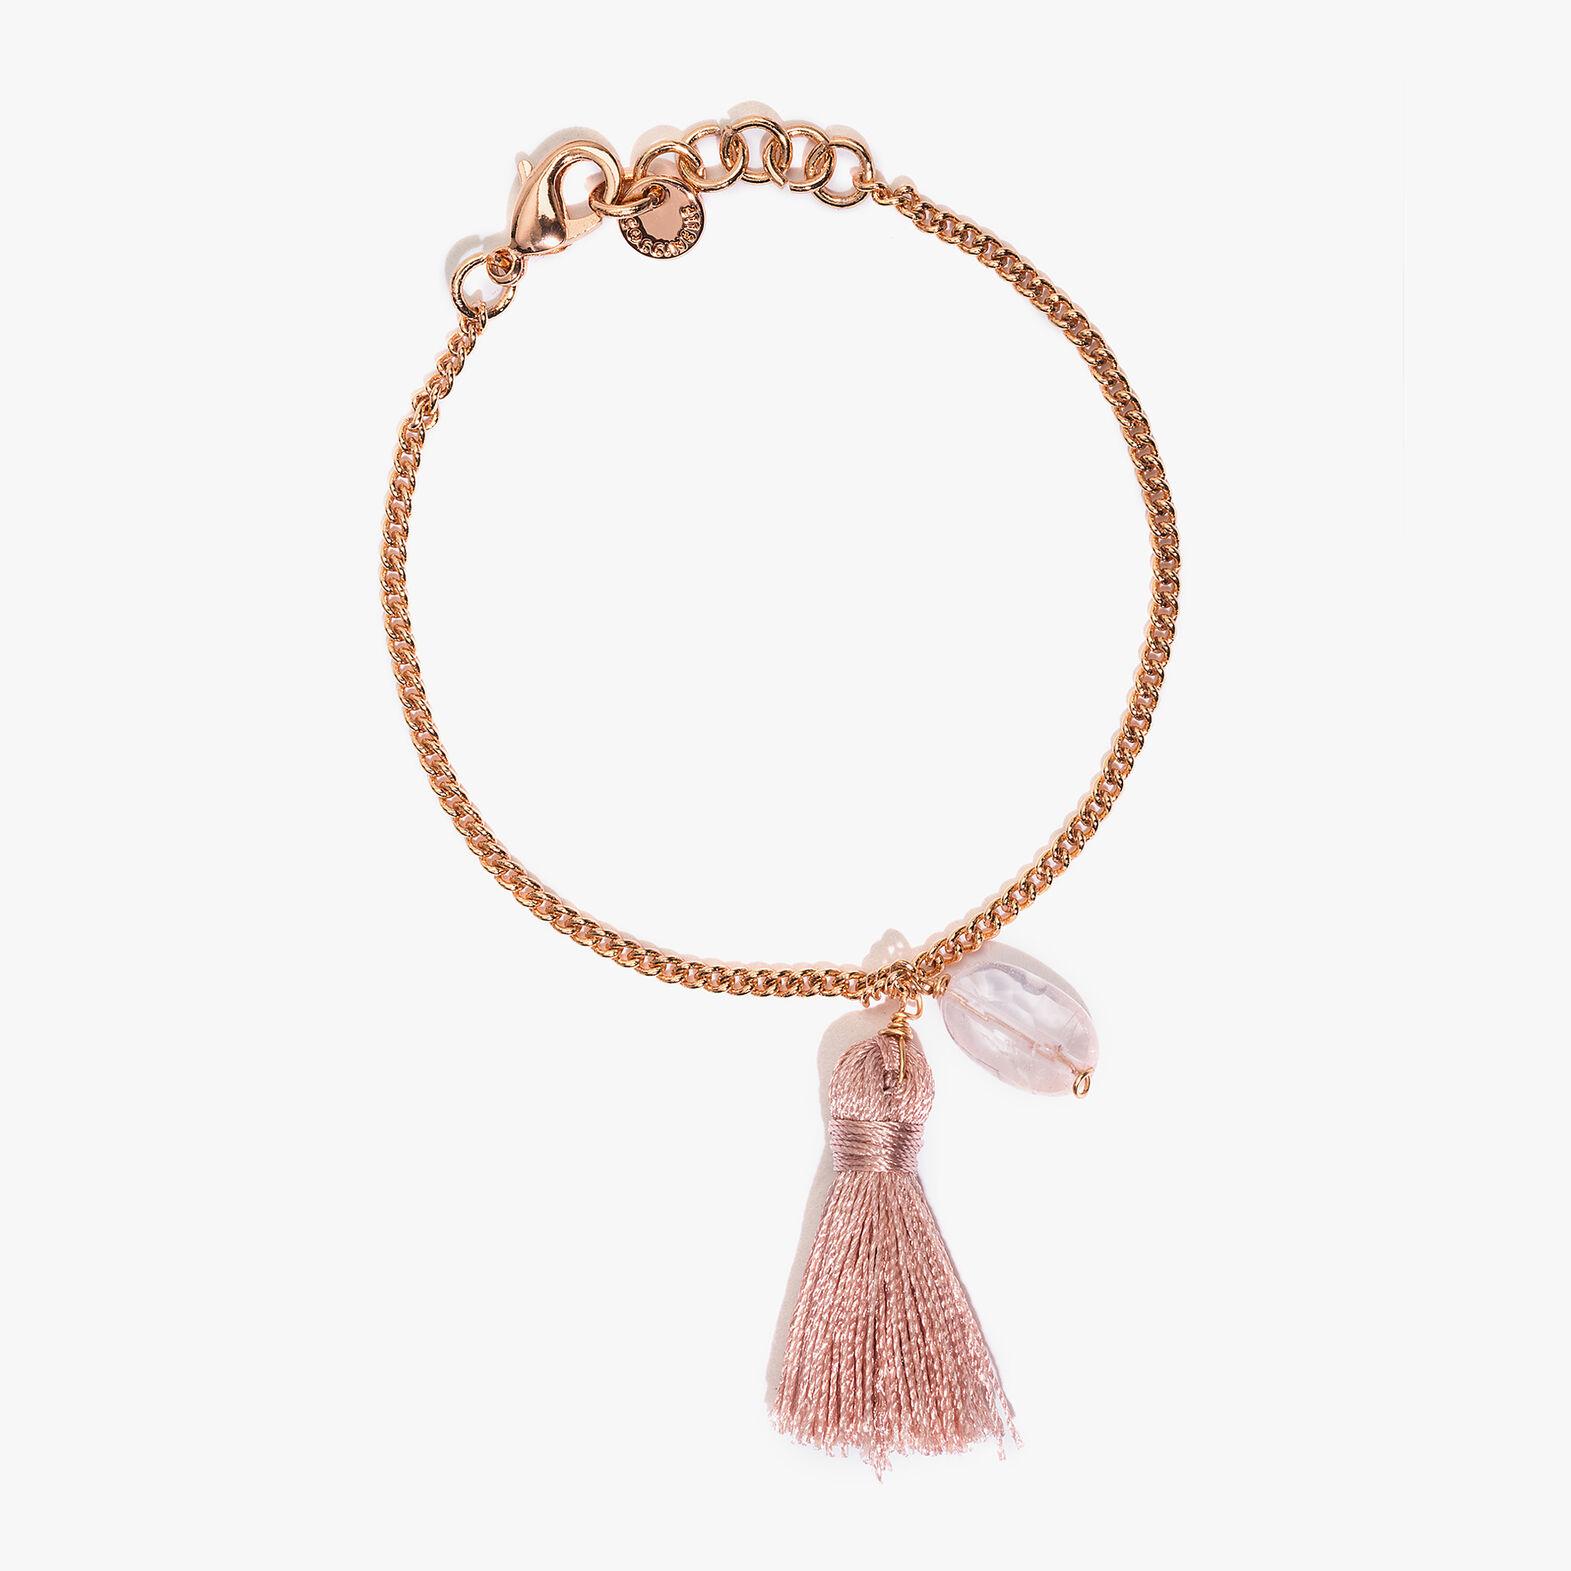 Silver and crystal bracelet